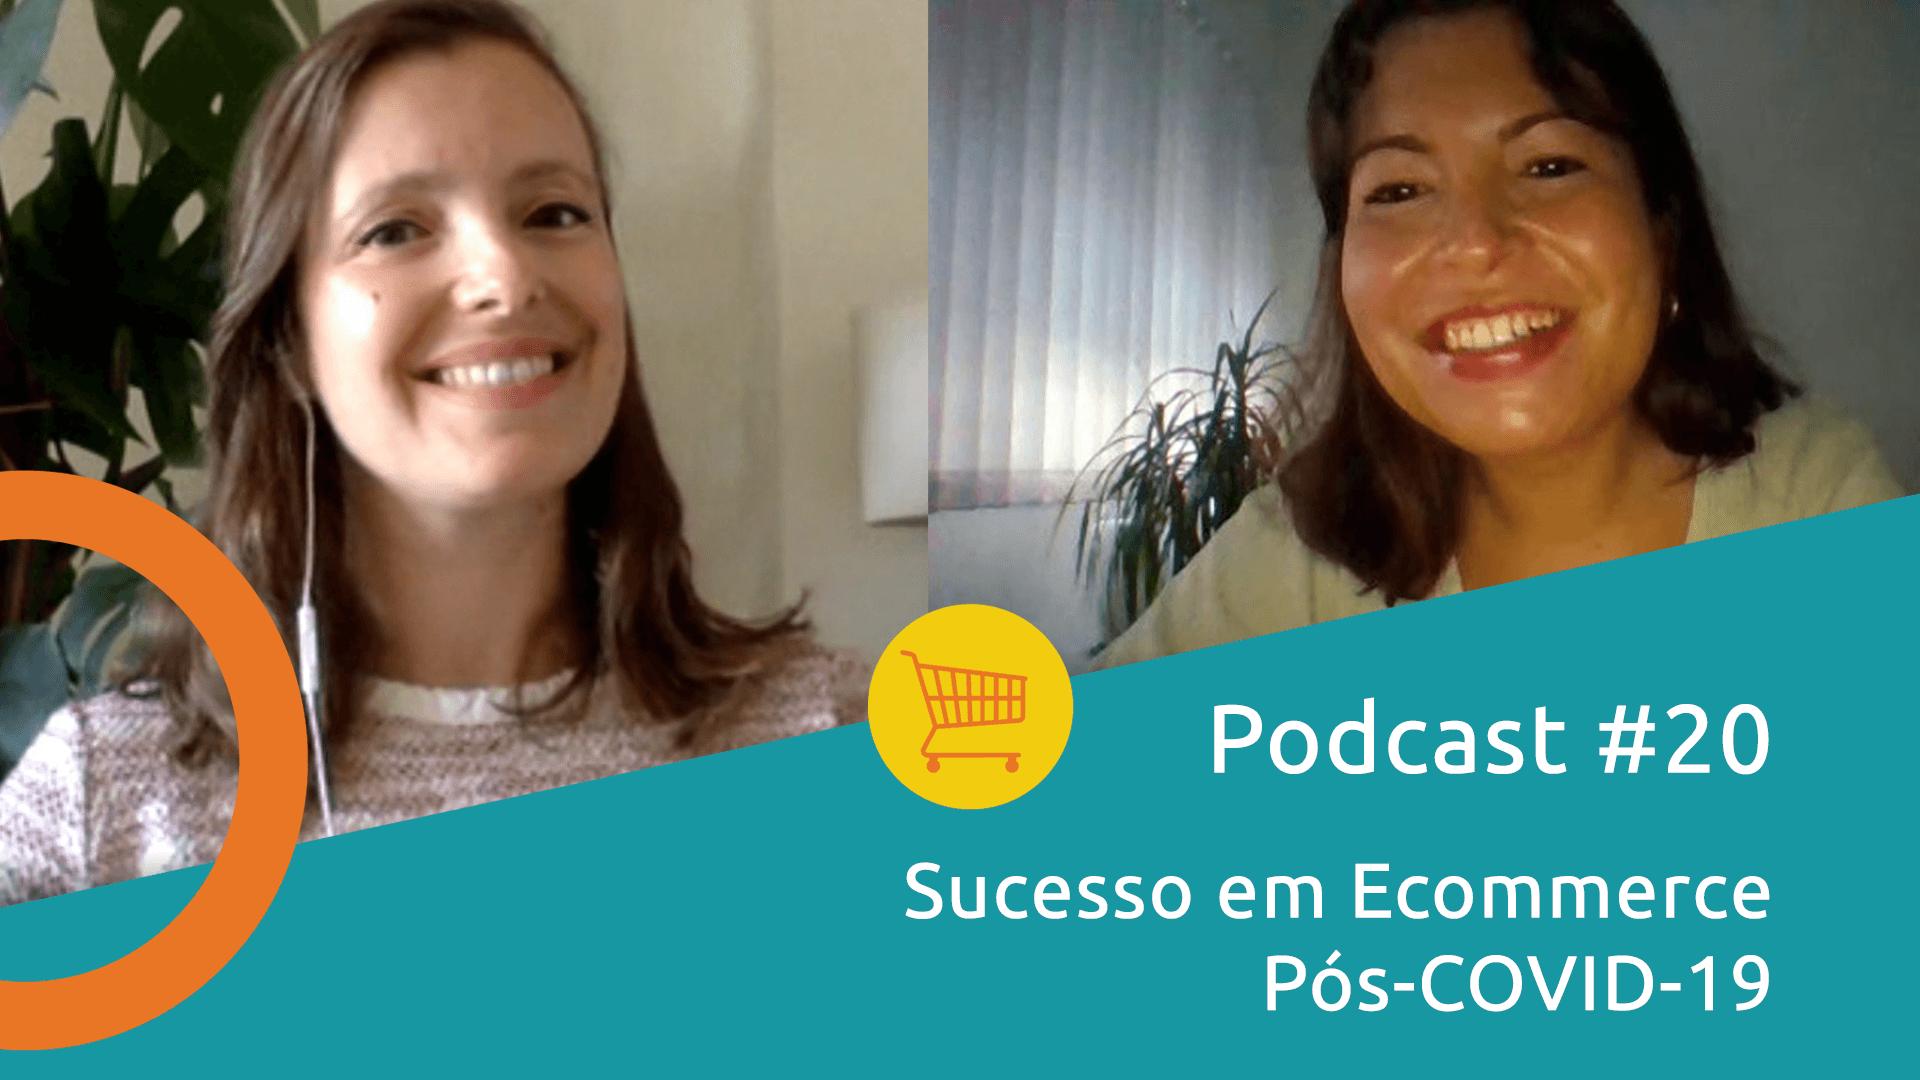 Podcast 20 - Sucesso em ecommerce pós Covid 19